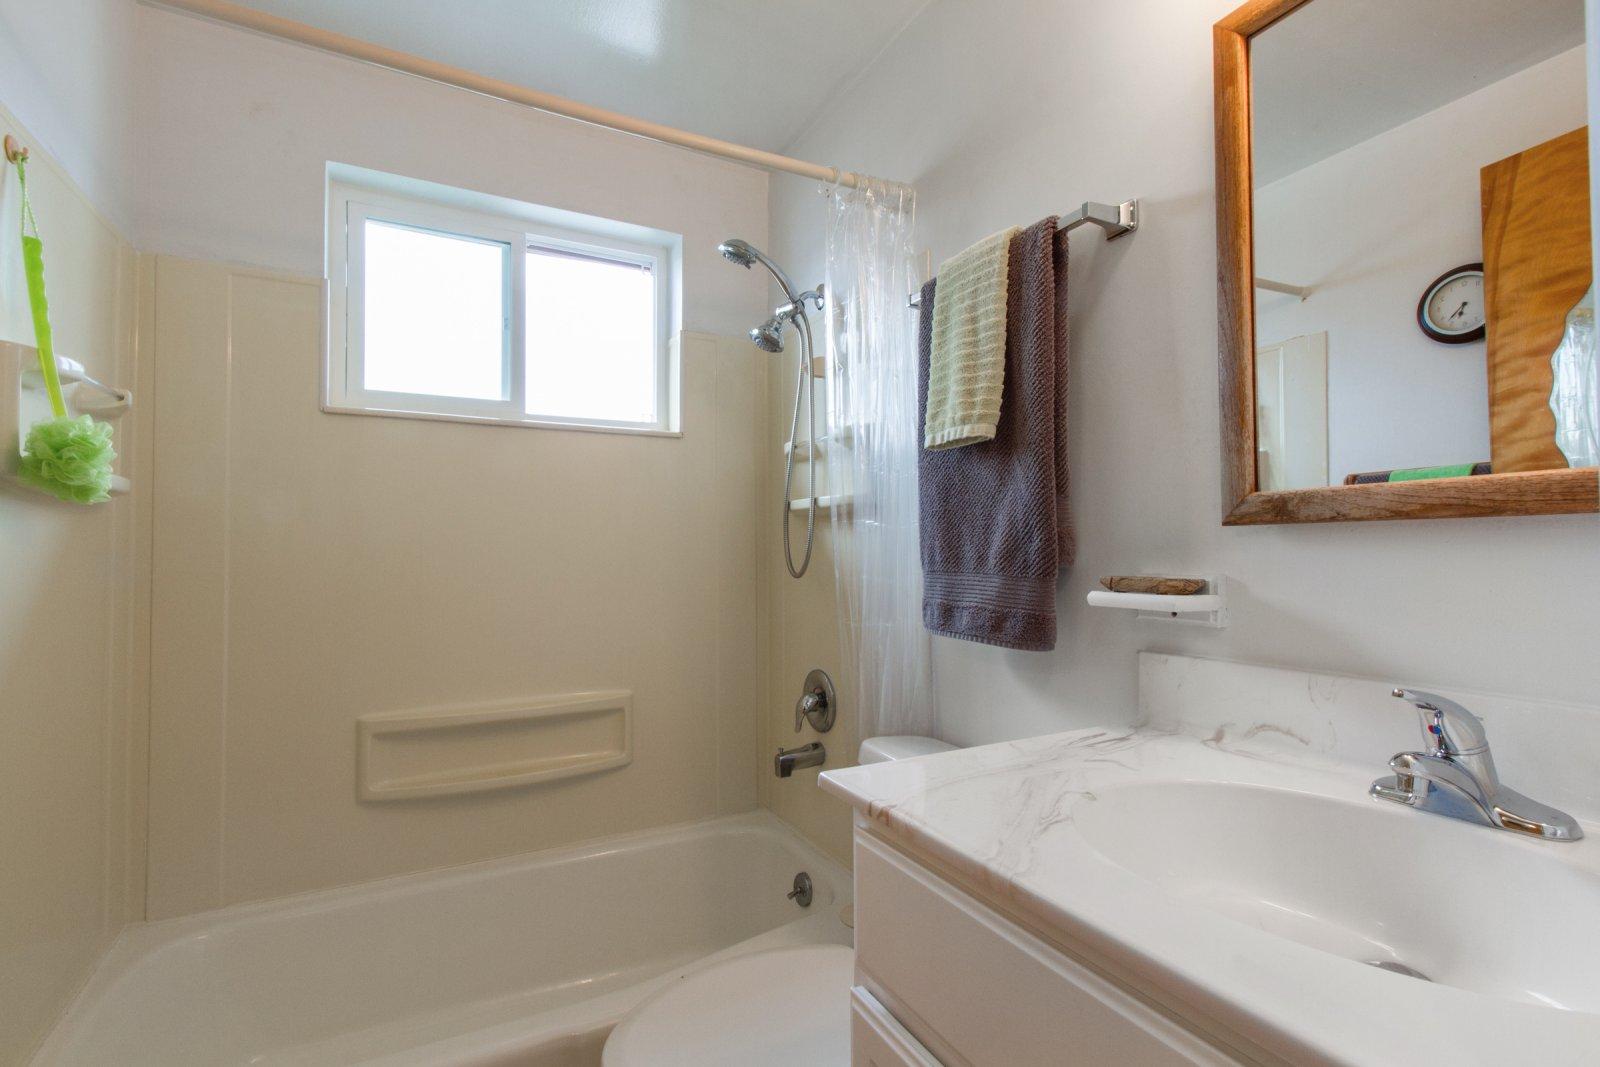 home for sale Layton Utah by Utahhomes.biz property picture 9